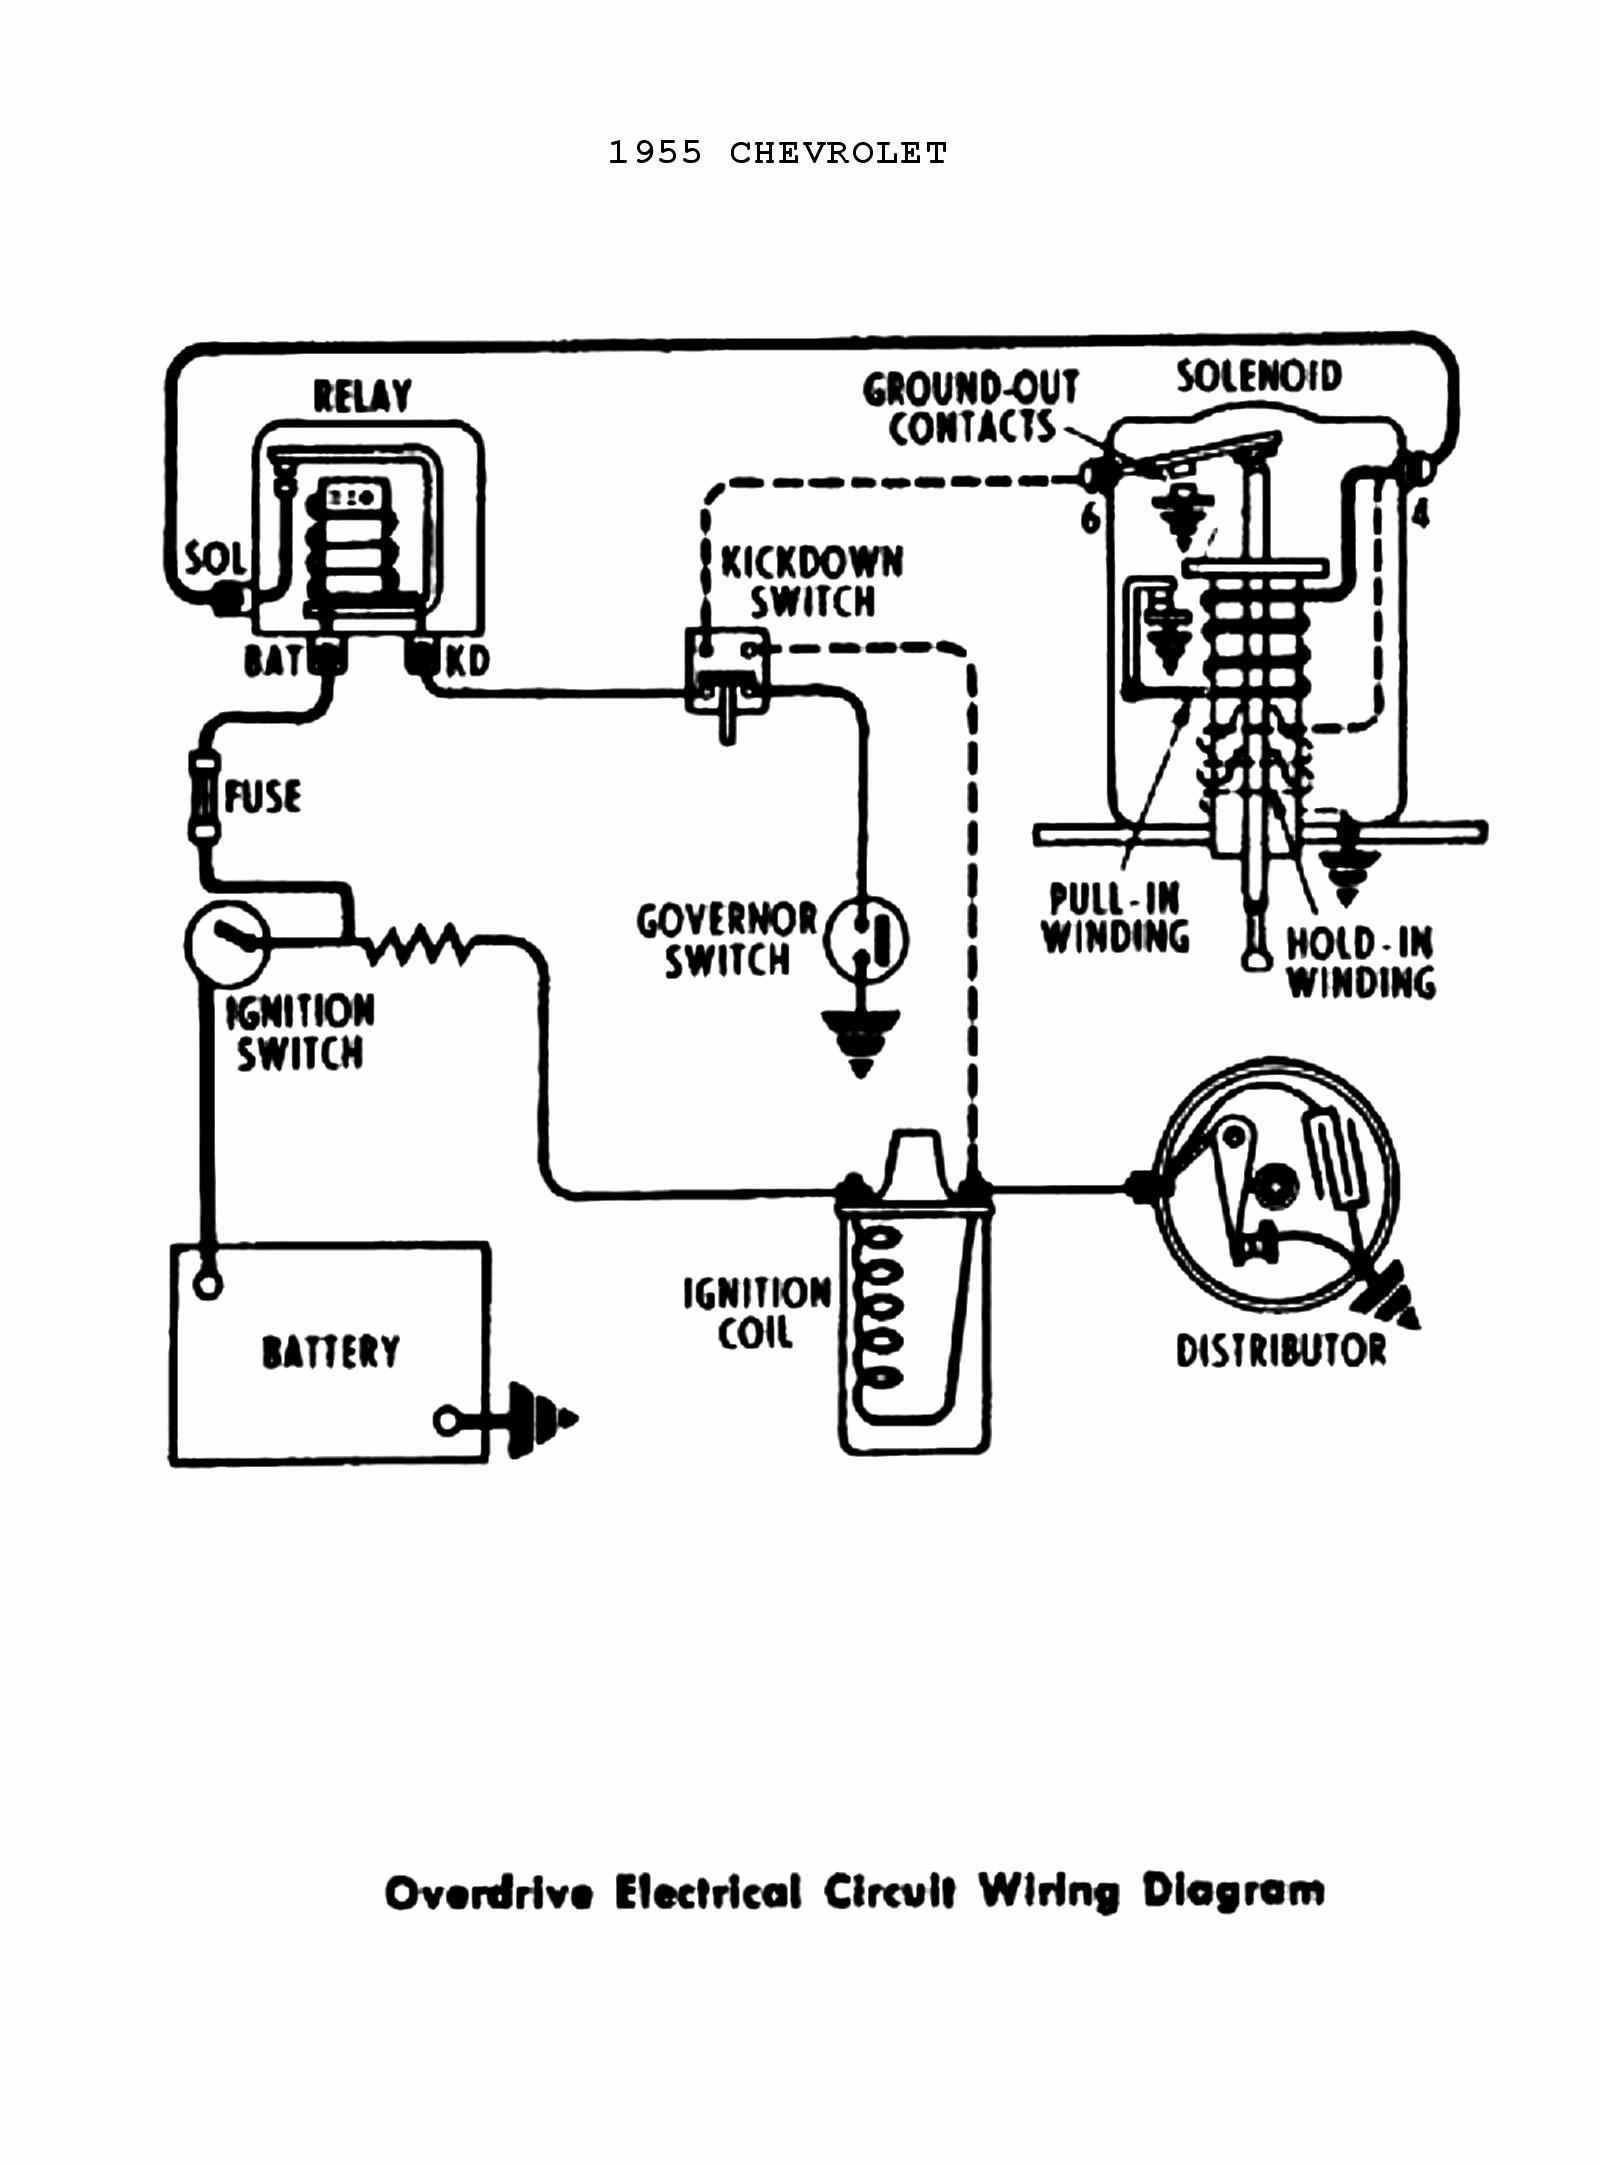 Train Horn Wire Diagram | Wiring Library - Train Horn Wiring Diagram